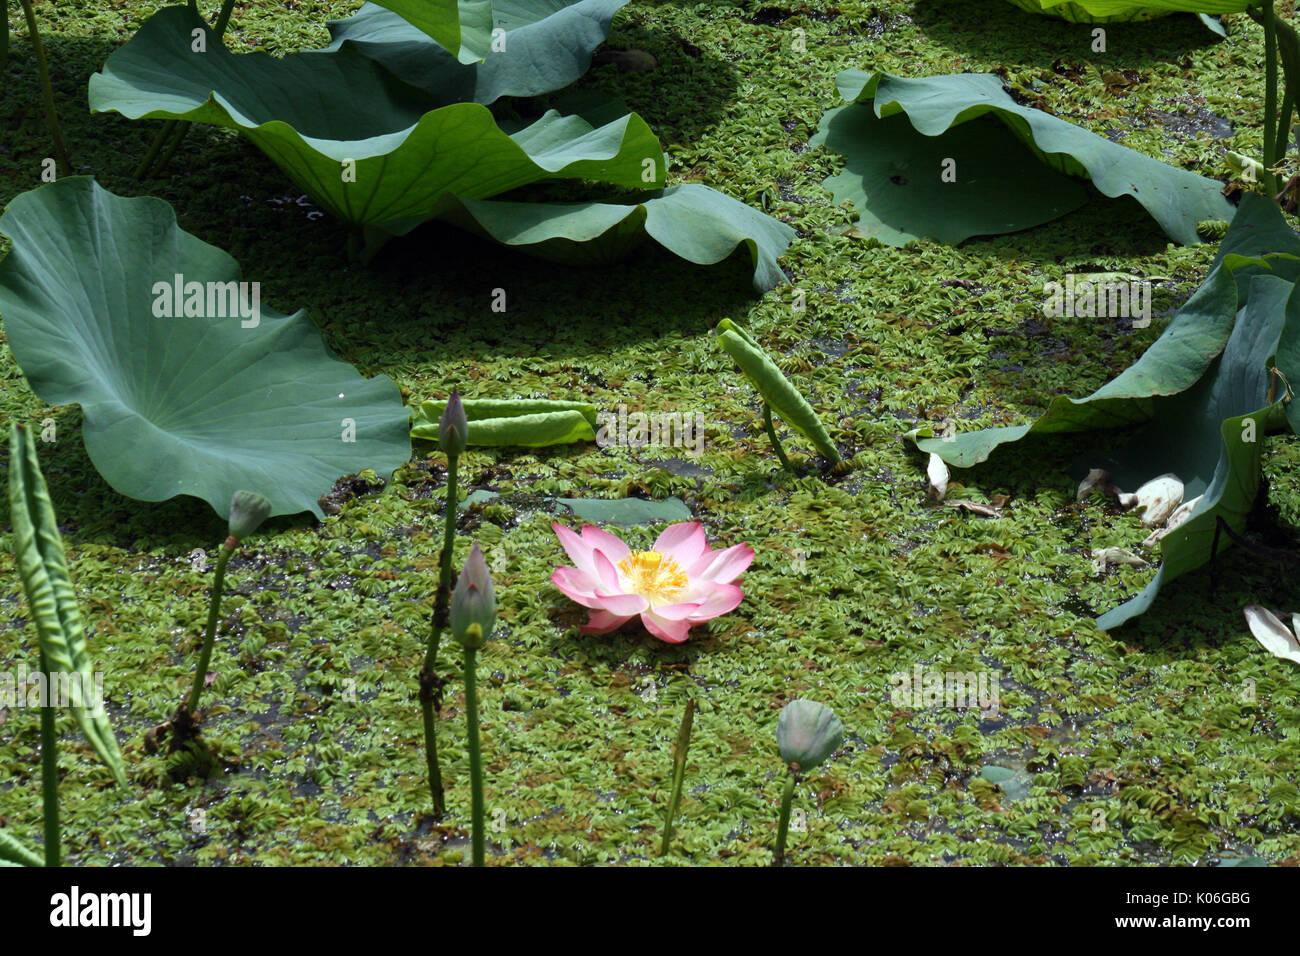 Srinagar Kashmir 22nd Aug 2017 A View Lotus Flower At Floating